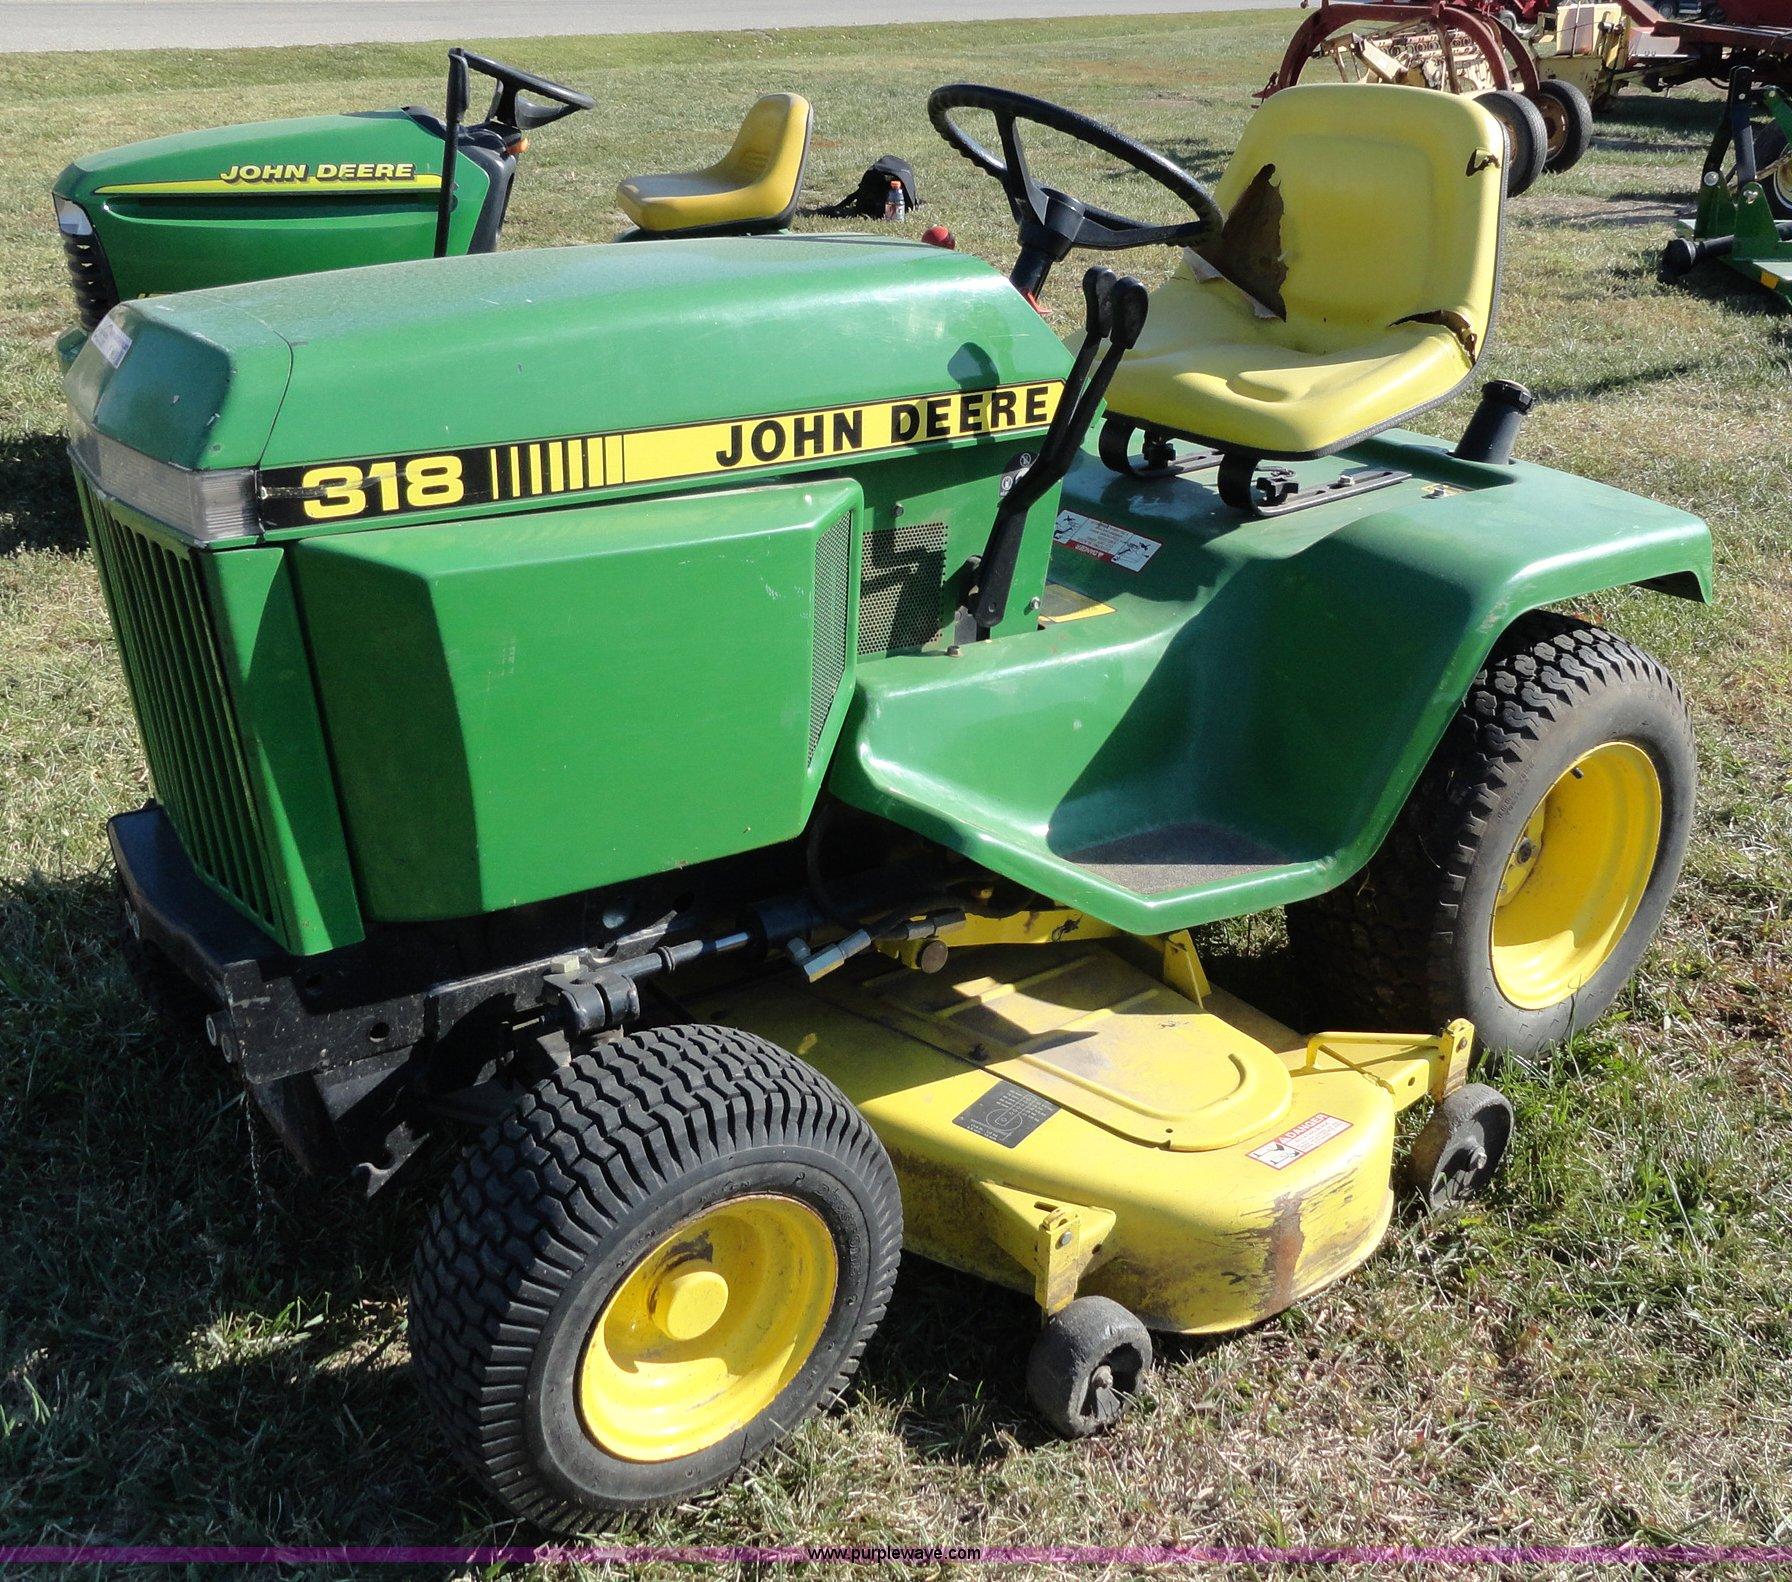 John Deere 318 >> John Deere 318 Lawn Mower Item F9419 Sold November 16 A